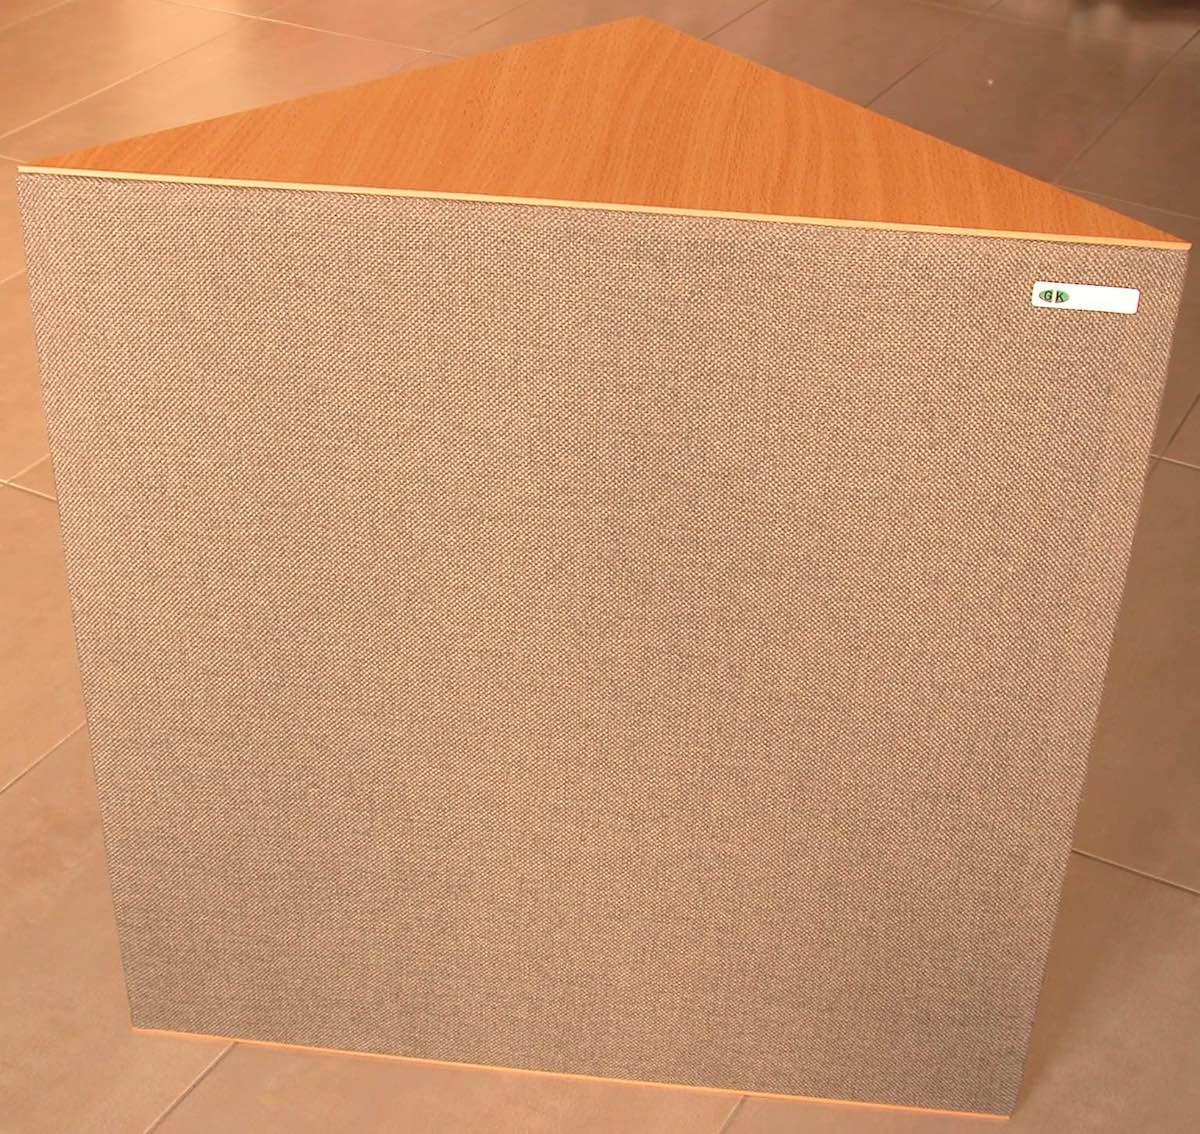 Gik-Acoustics-Demi-Tri-Trap audiofader